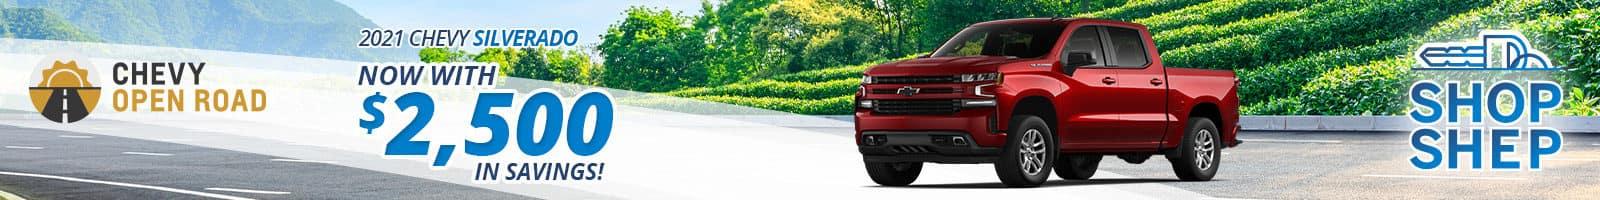 Best deal on a 2021 Chevy Silverado 1500 near Fort Wayne IN